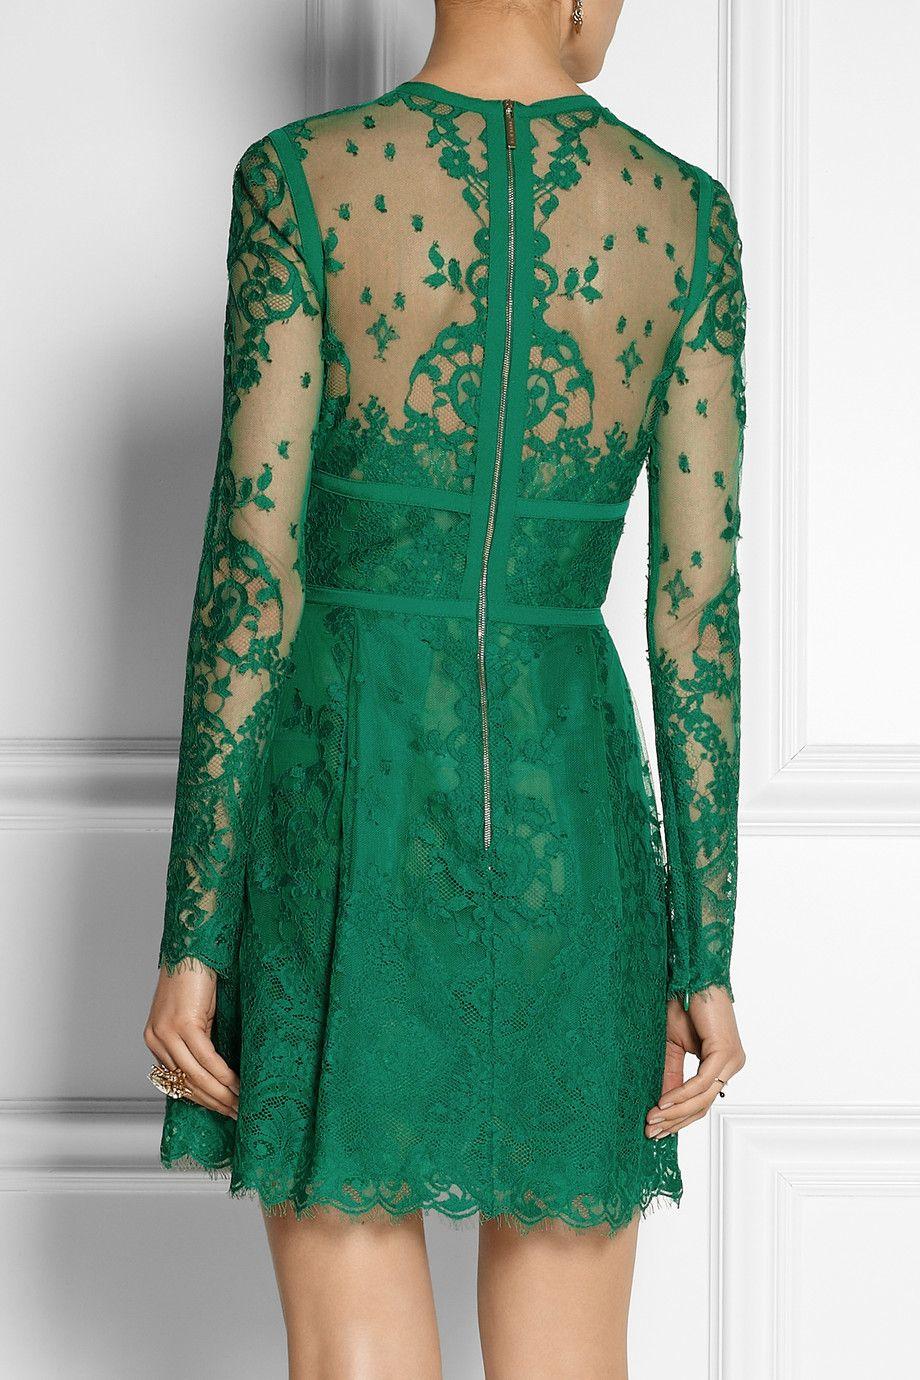 Elie Saab   Lace mini dress   NET-A-PORTER.COM   Elie Saab ...